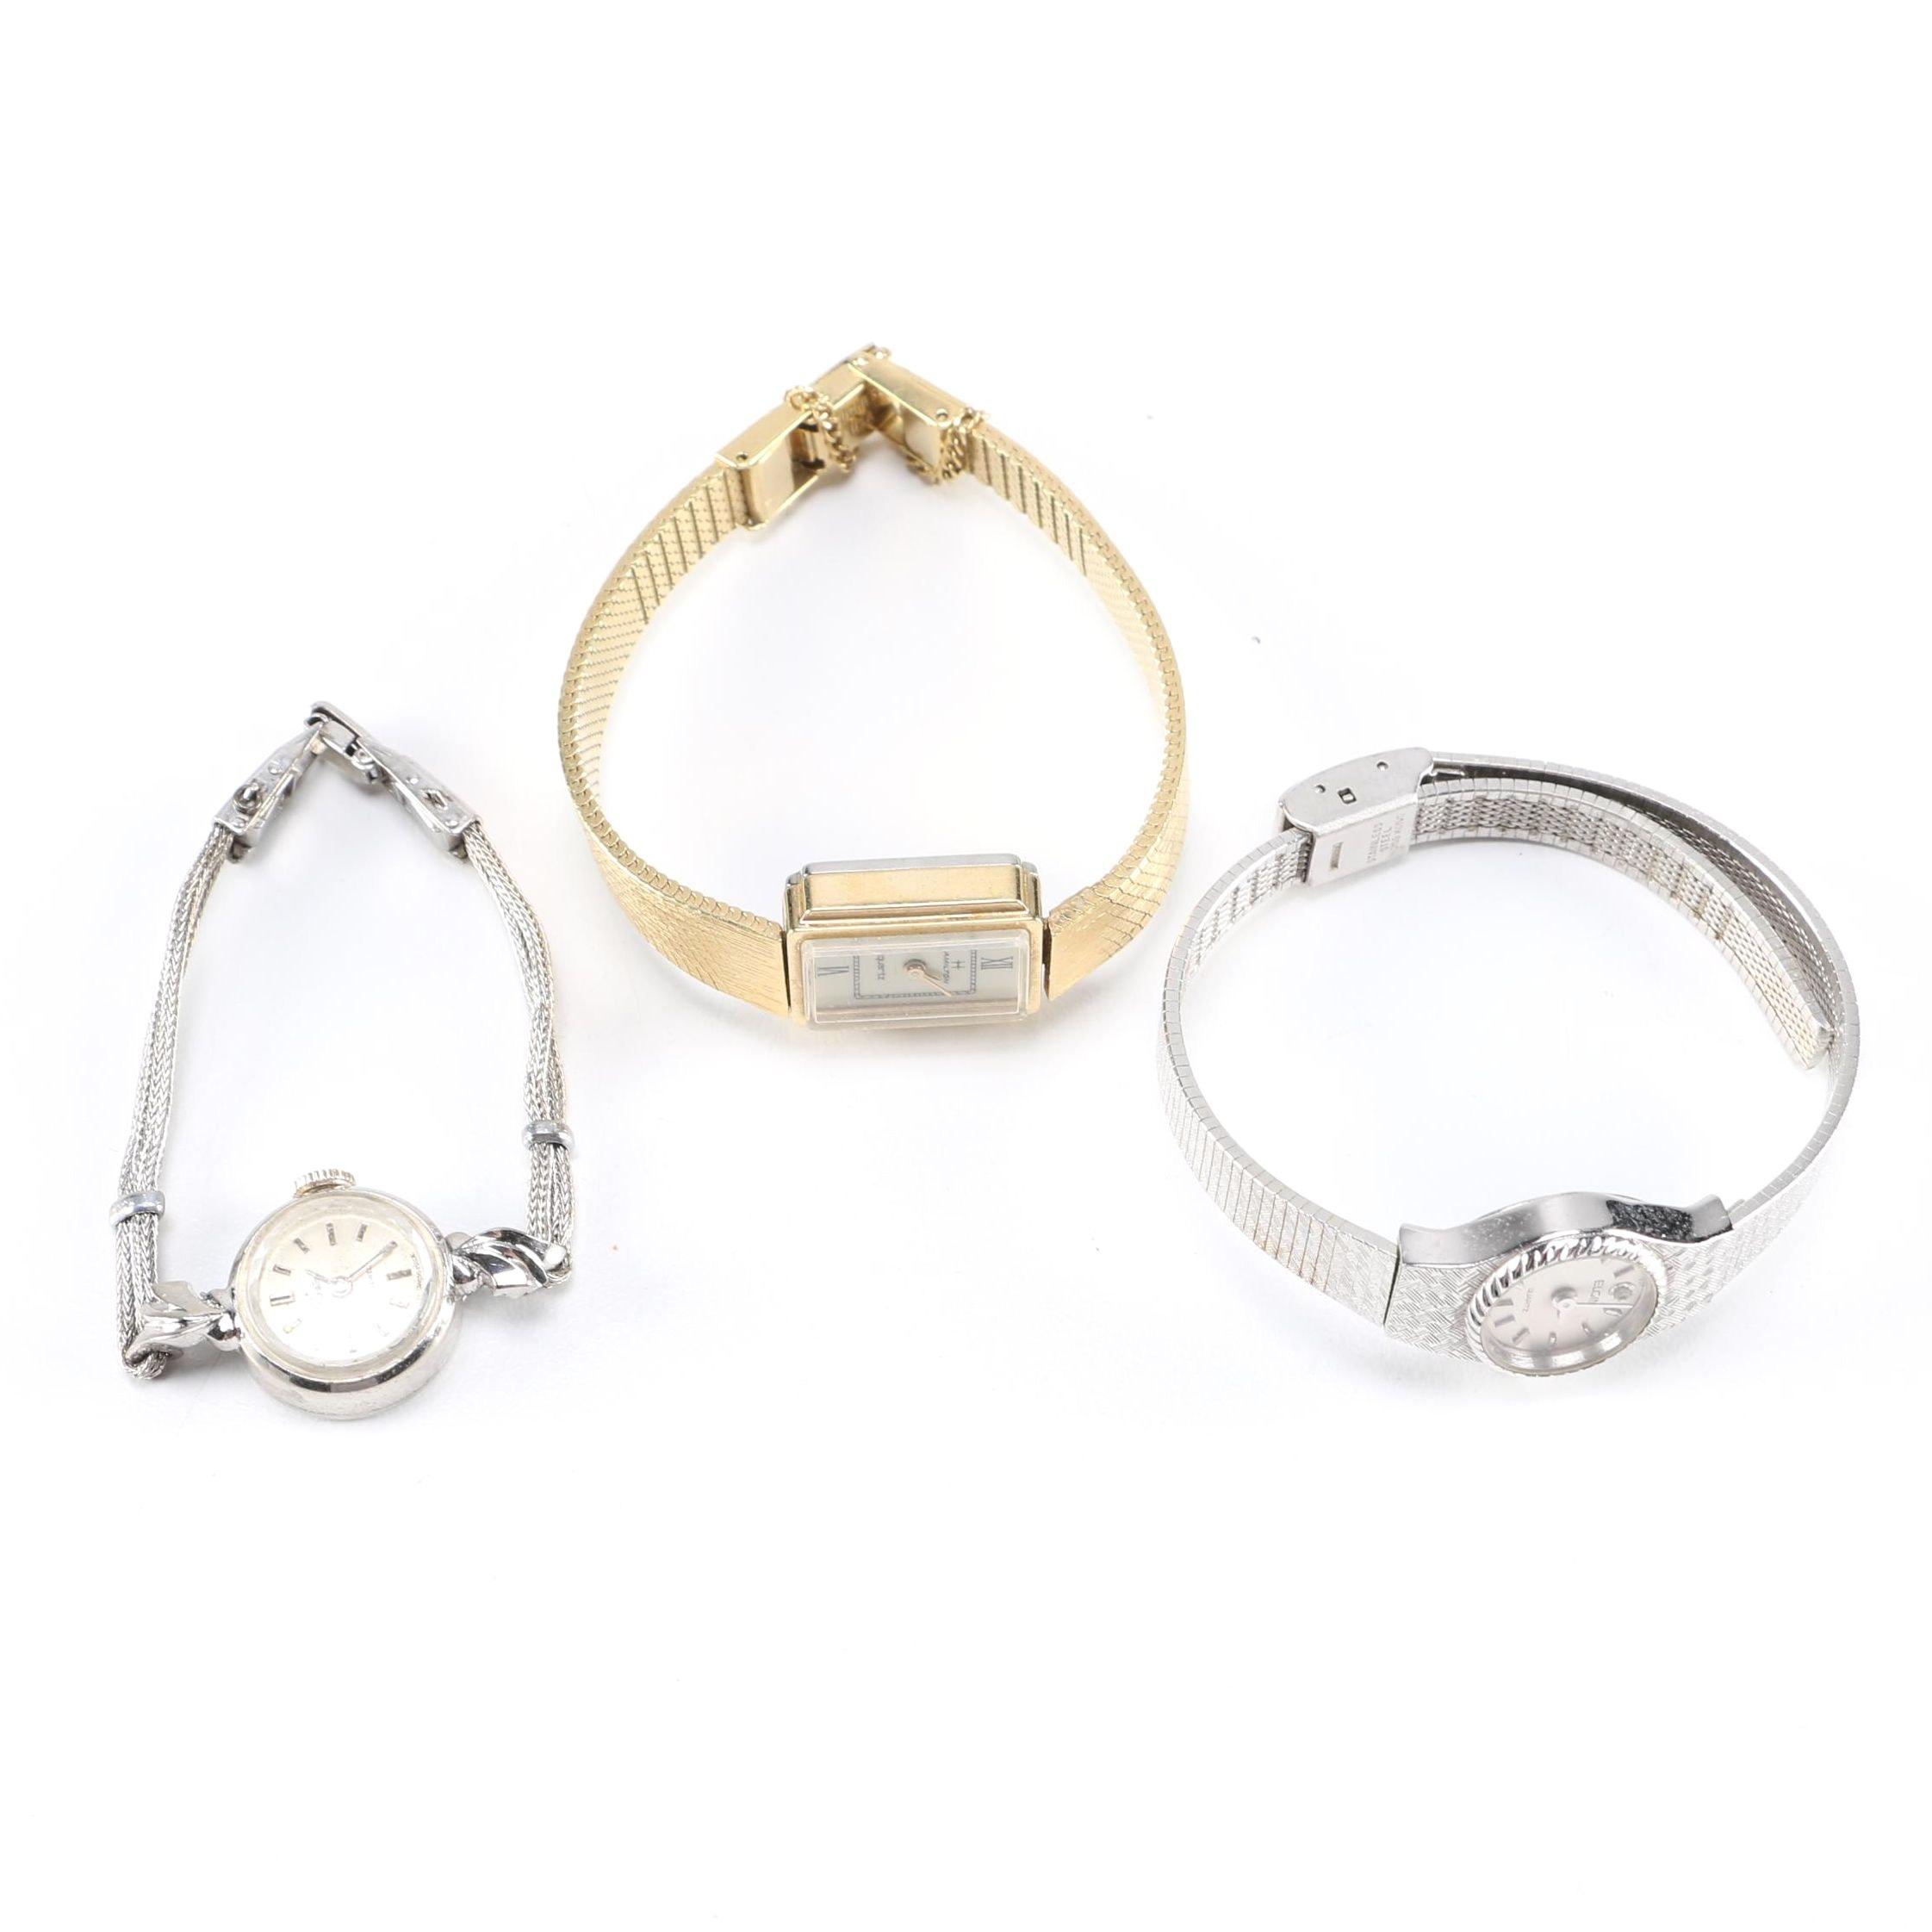 Vintage Wristwatches Including Elgin